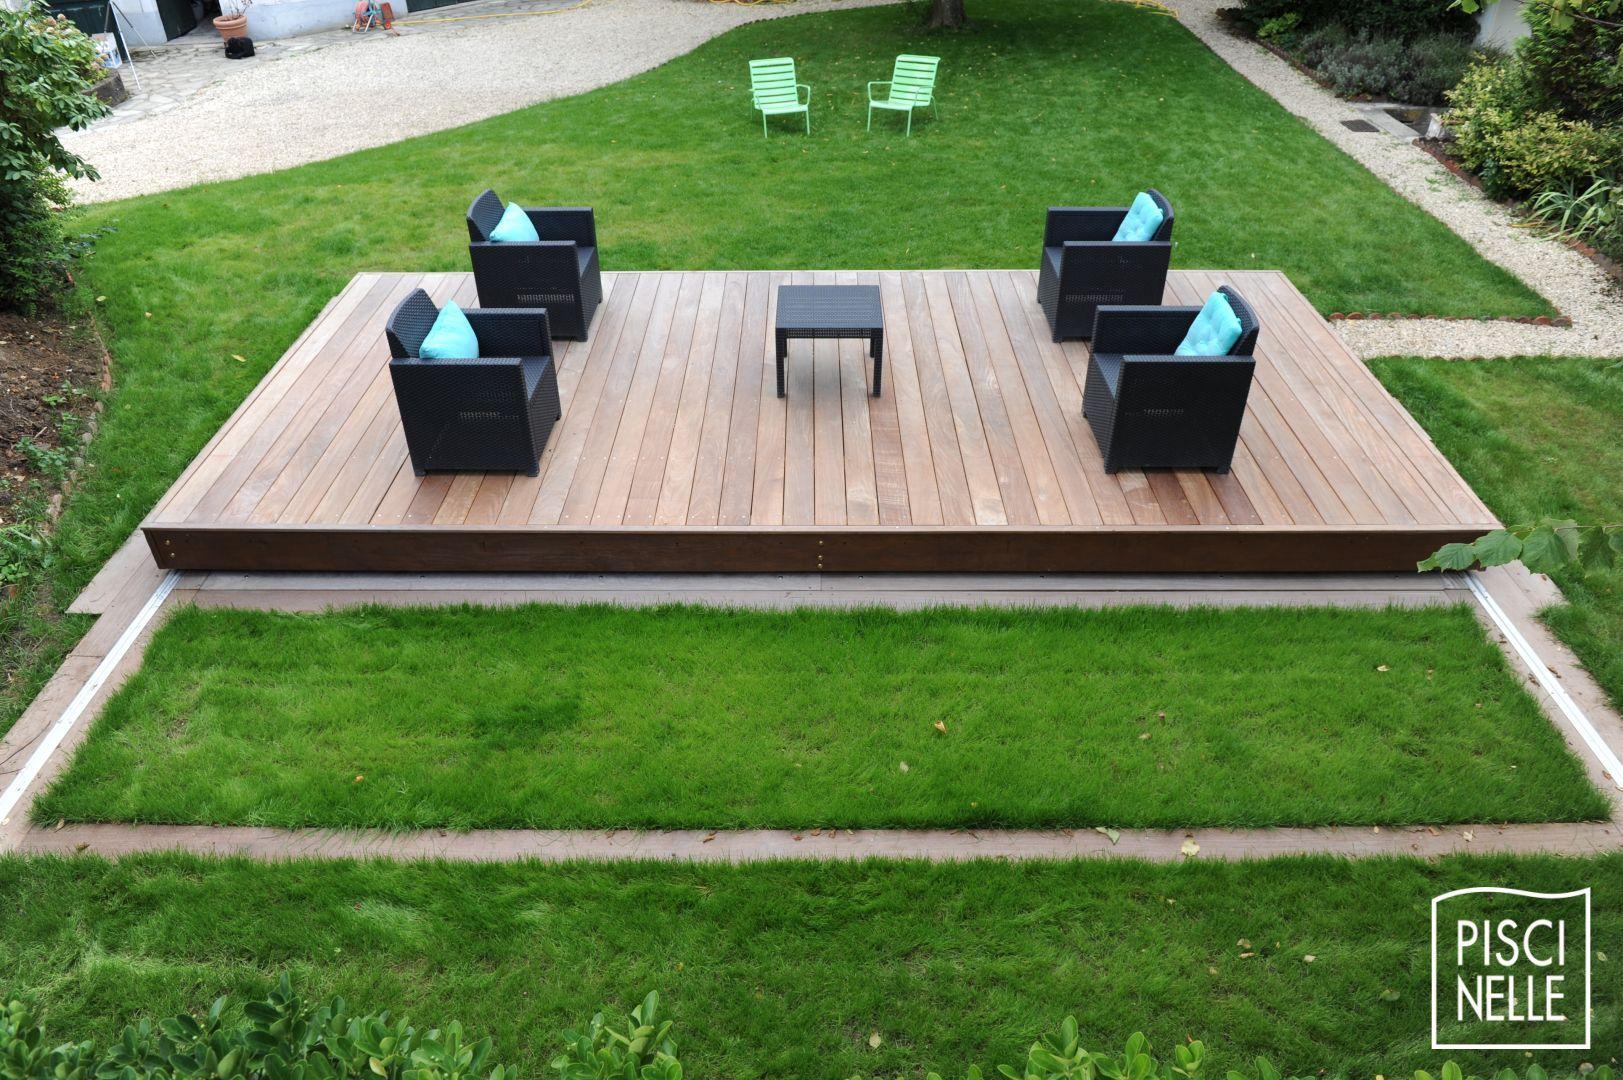 Prix Piscine Aquilus Mini Water terrasse piscine mobile : le rolling-deck piscinelle